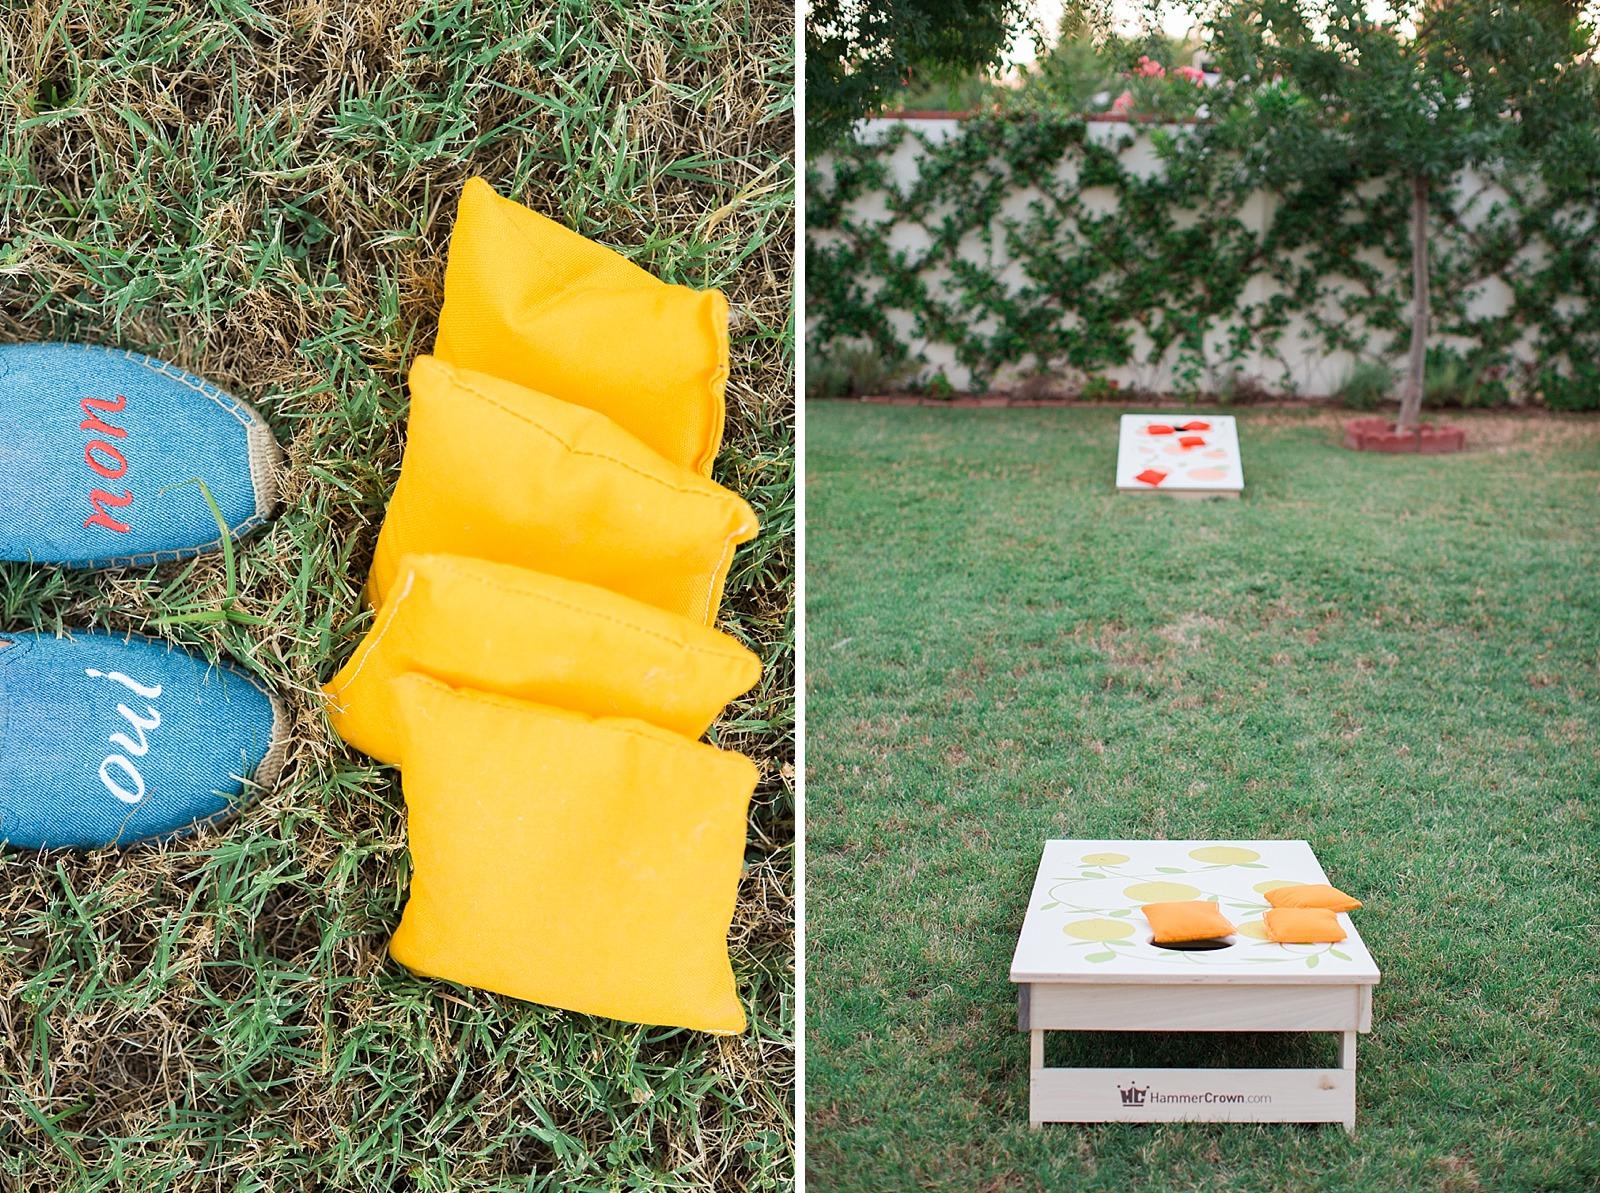 diana-elizabeth-steffen-phoenix-blogger-backyard-games-tosso-com-corn-hole-cornhole-citrus-theme_0091